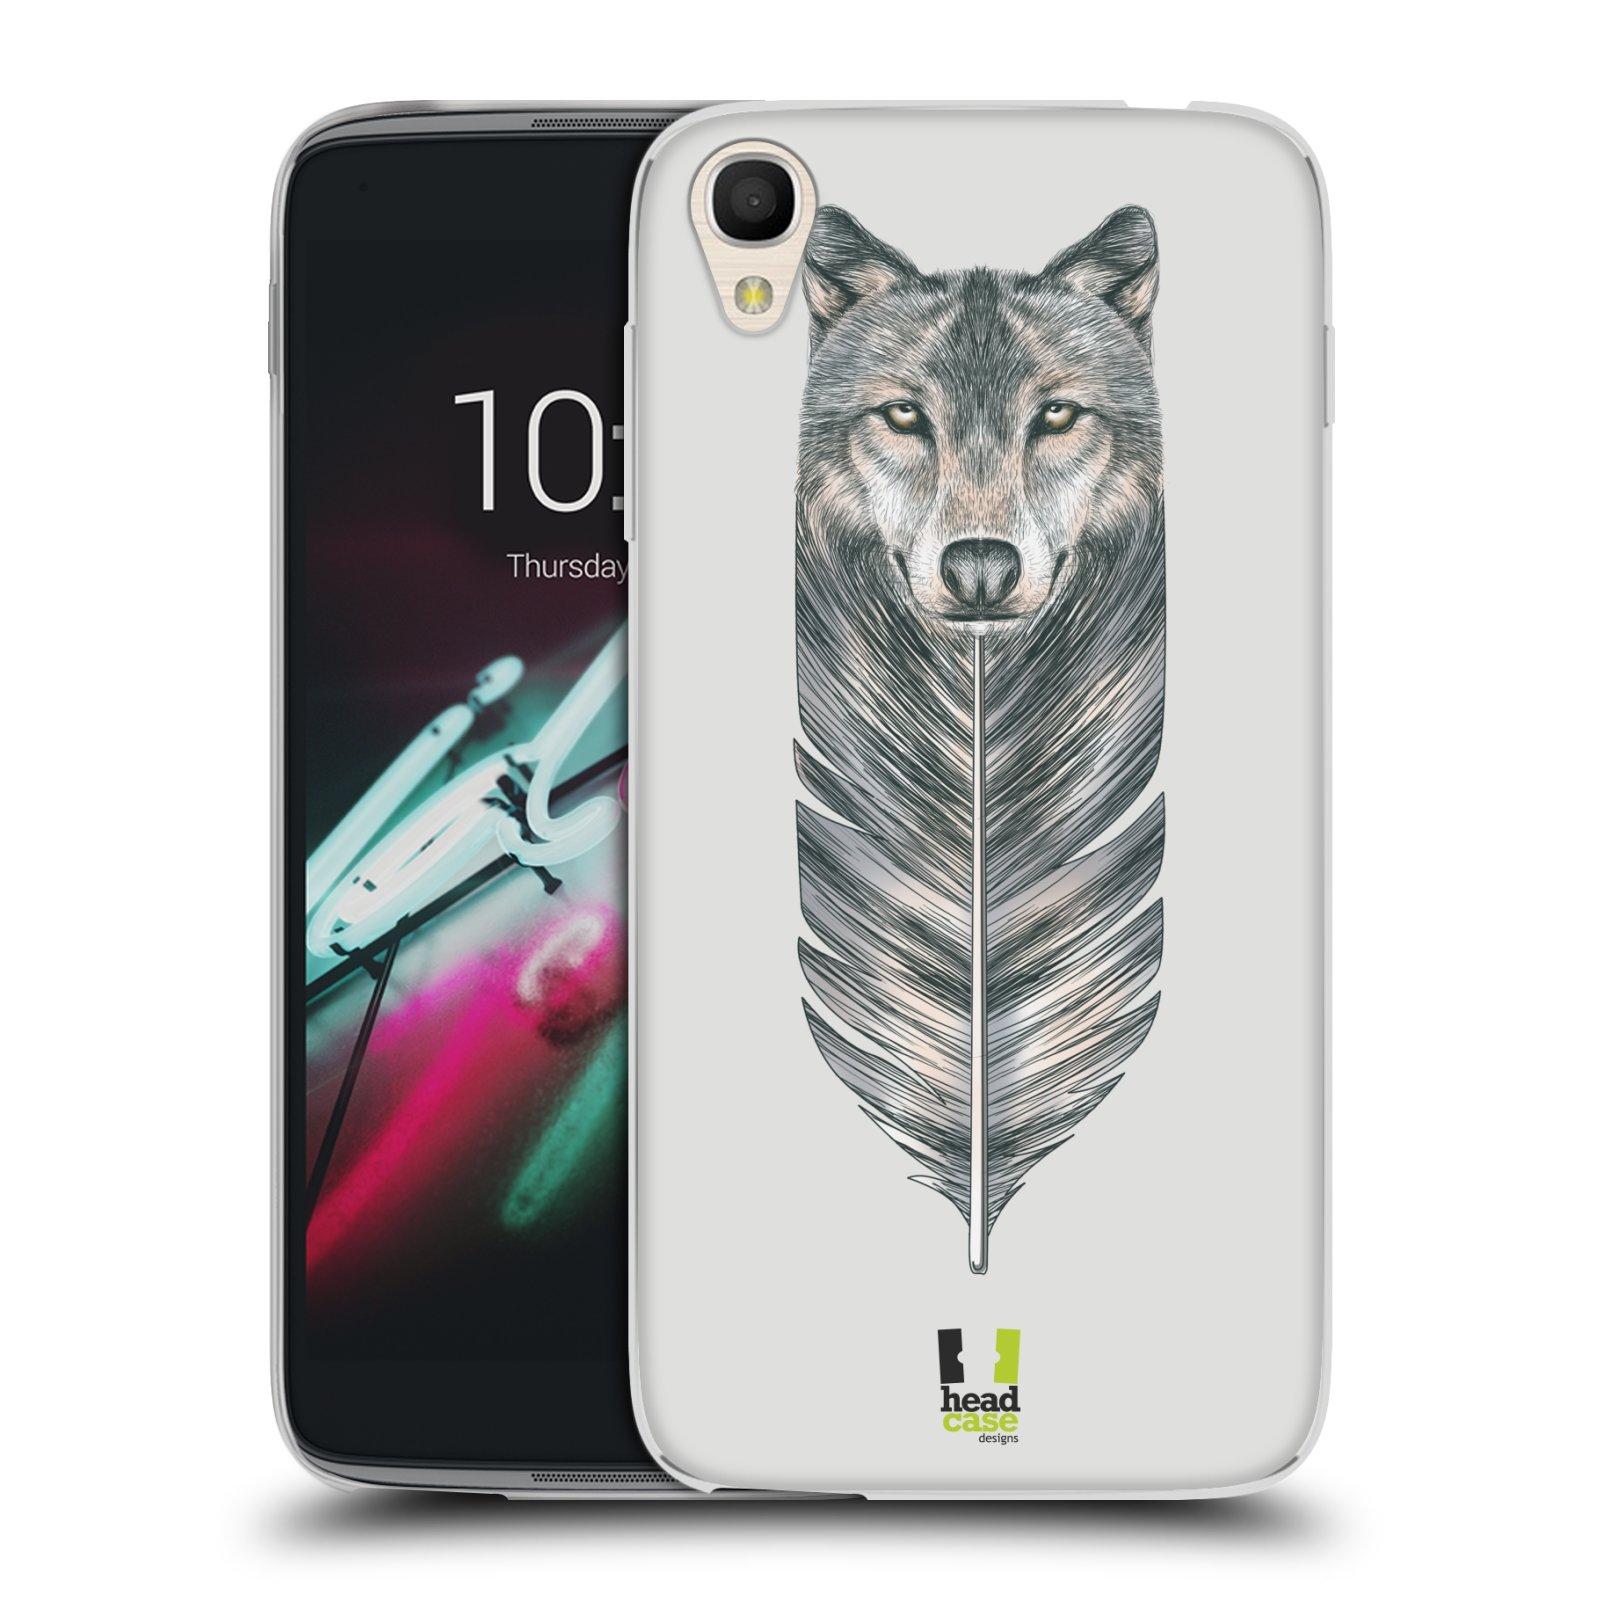 HEAD CASE silikonový obal na mobil Alcatel Idol 3 OT-6039Y (4.7) vzor zvířecí pírka vlk